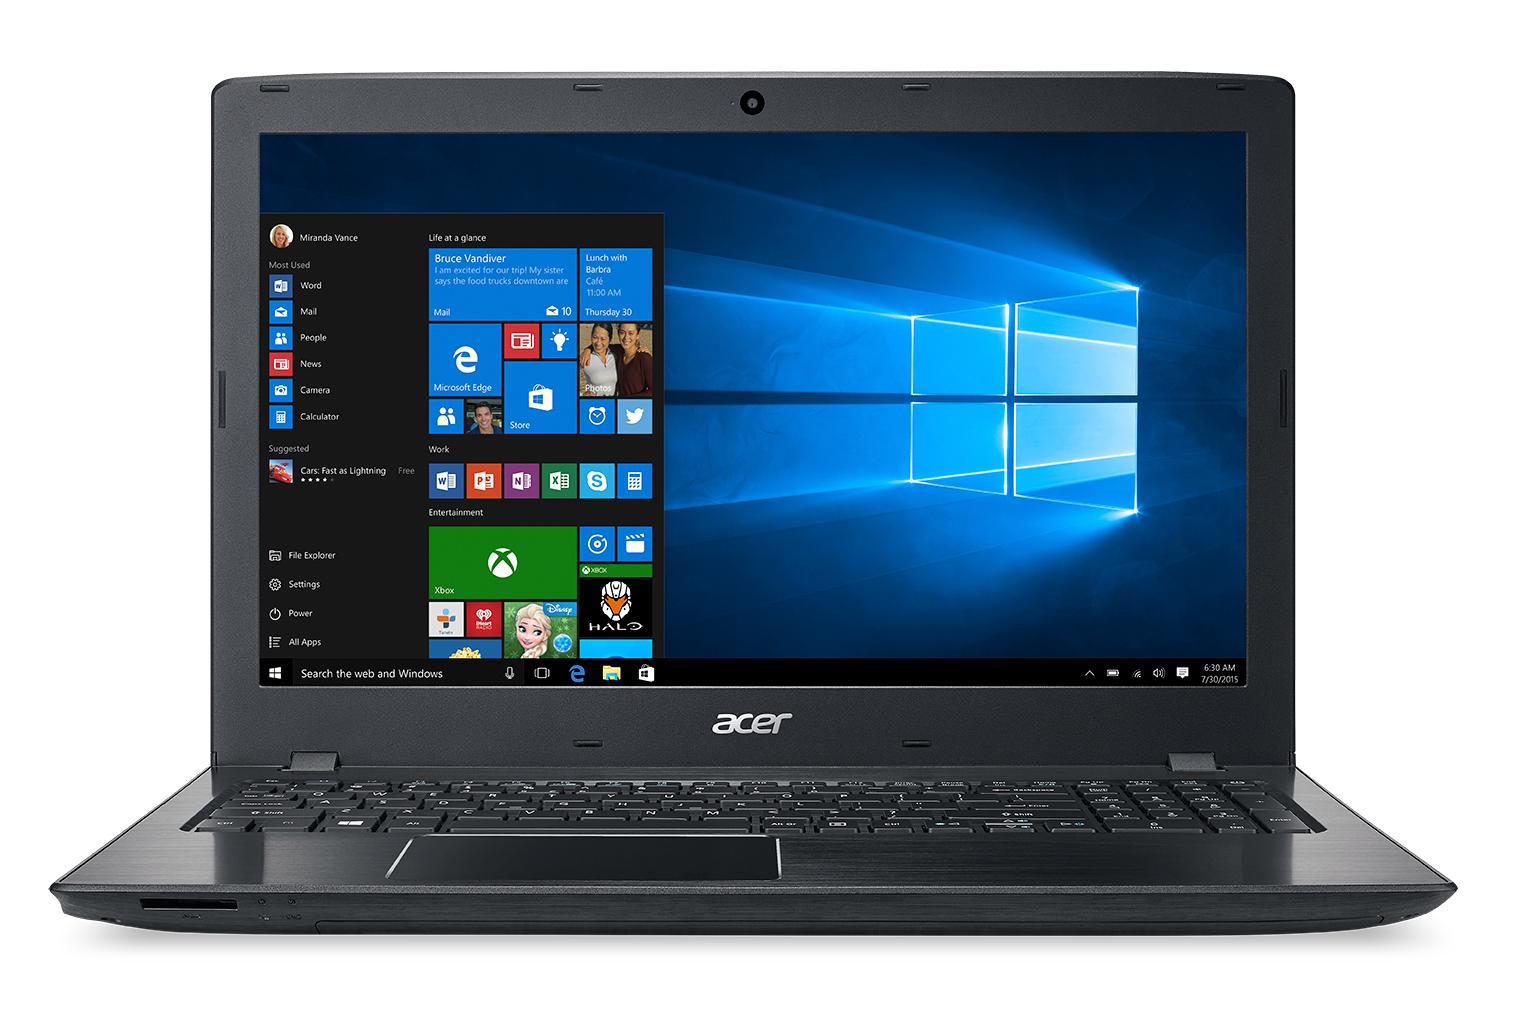 Acer Aspire E5-575-72N3: 15.6'' FHD, i7-7500U, 8GB DDR4, 1TB HDD, Type-C, Win10H @ $459 + F/S at Walmart